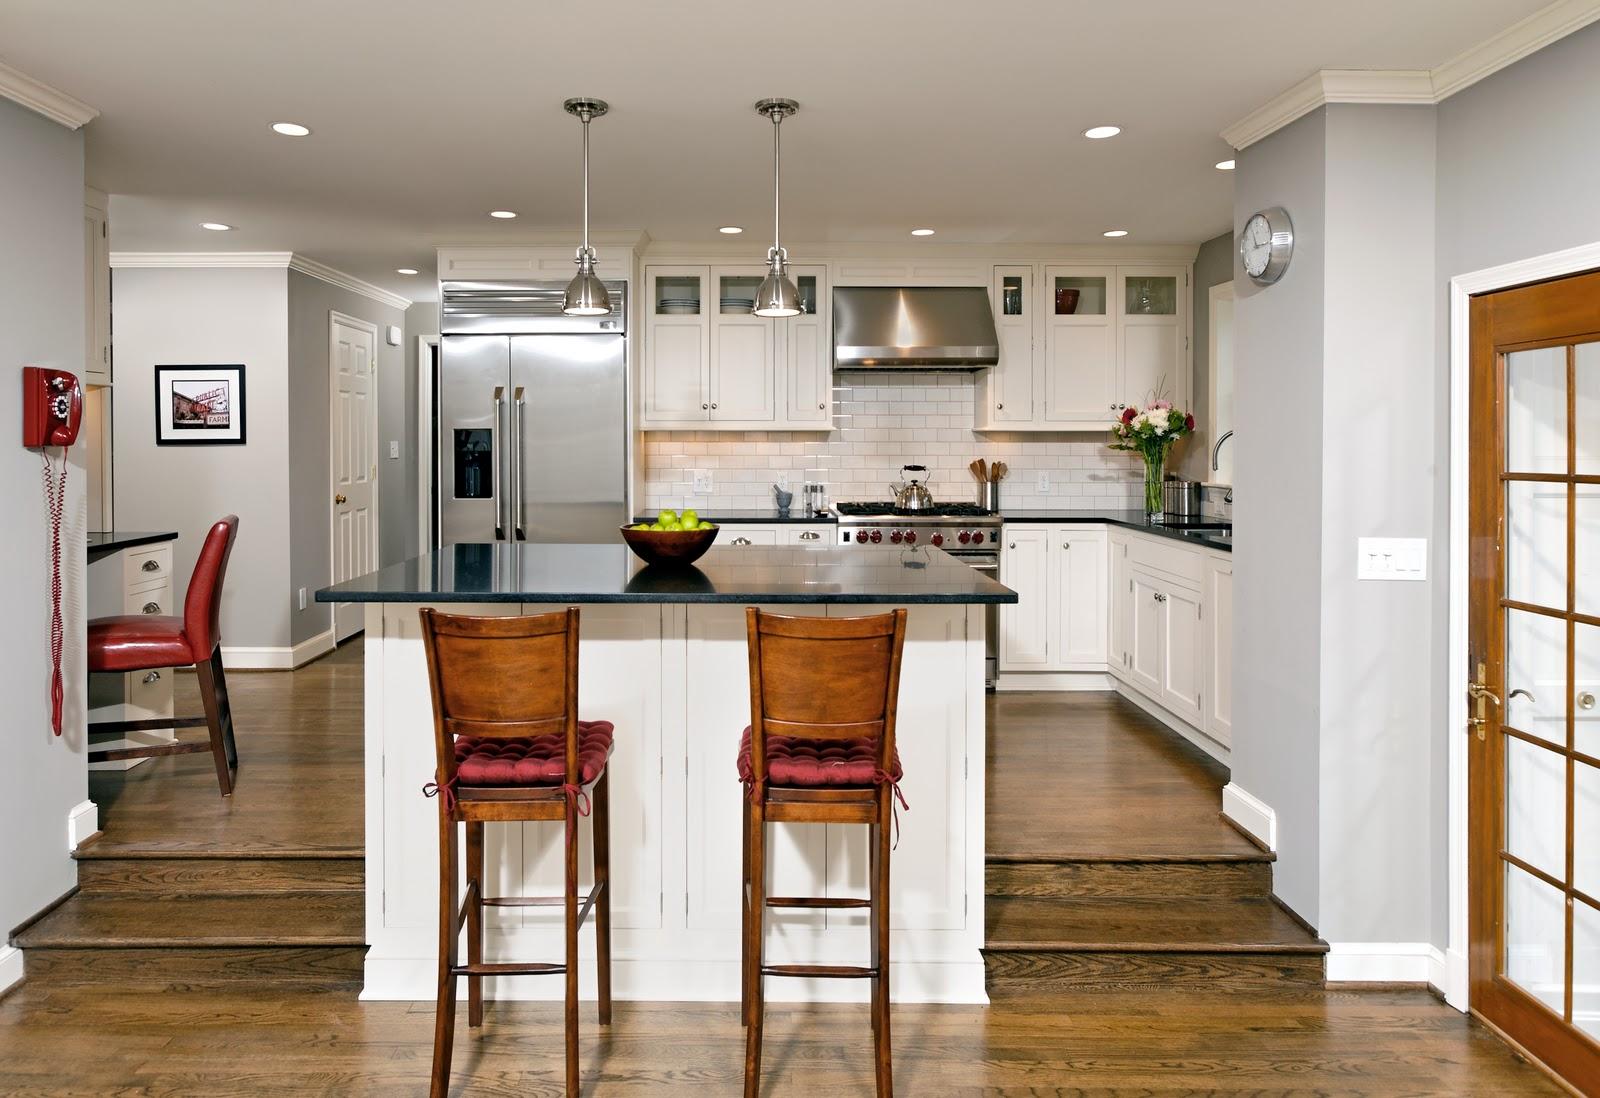 Virginia Kitchens Blog: Award Winning Kitchen Design